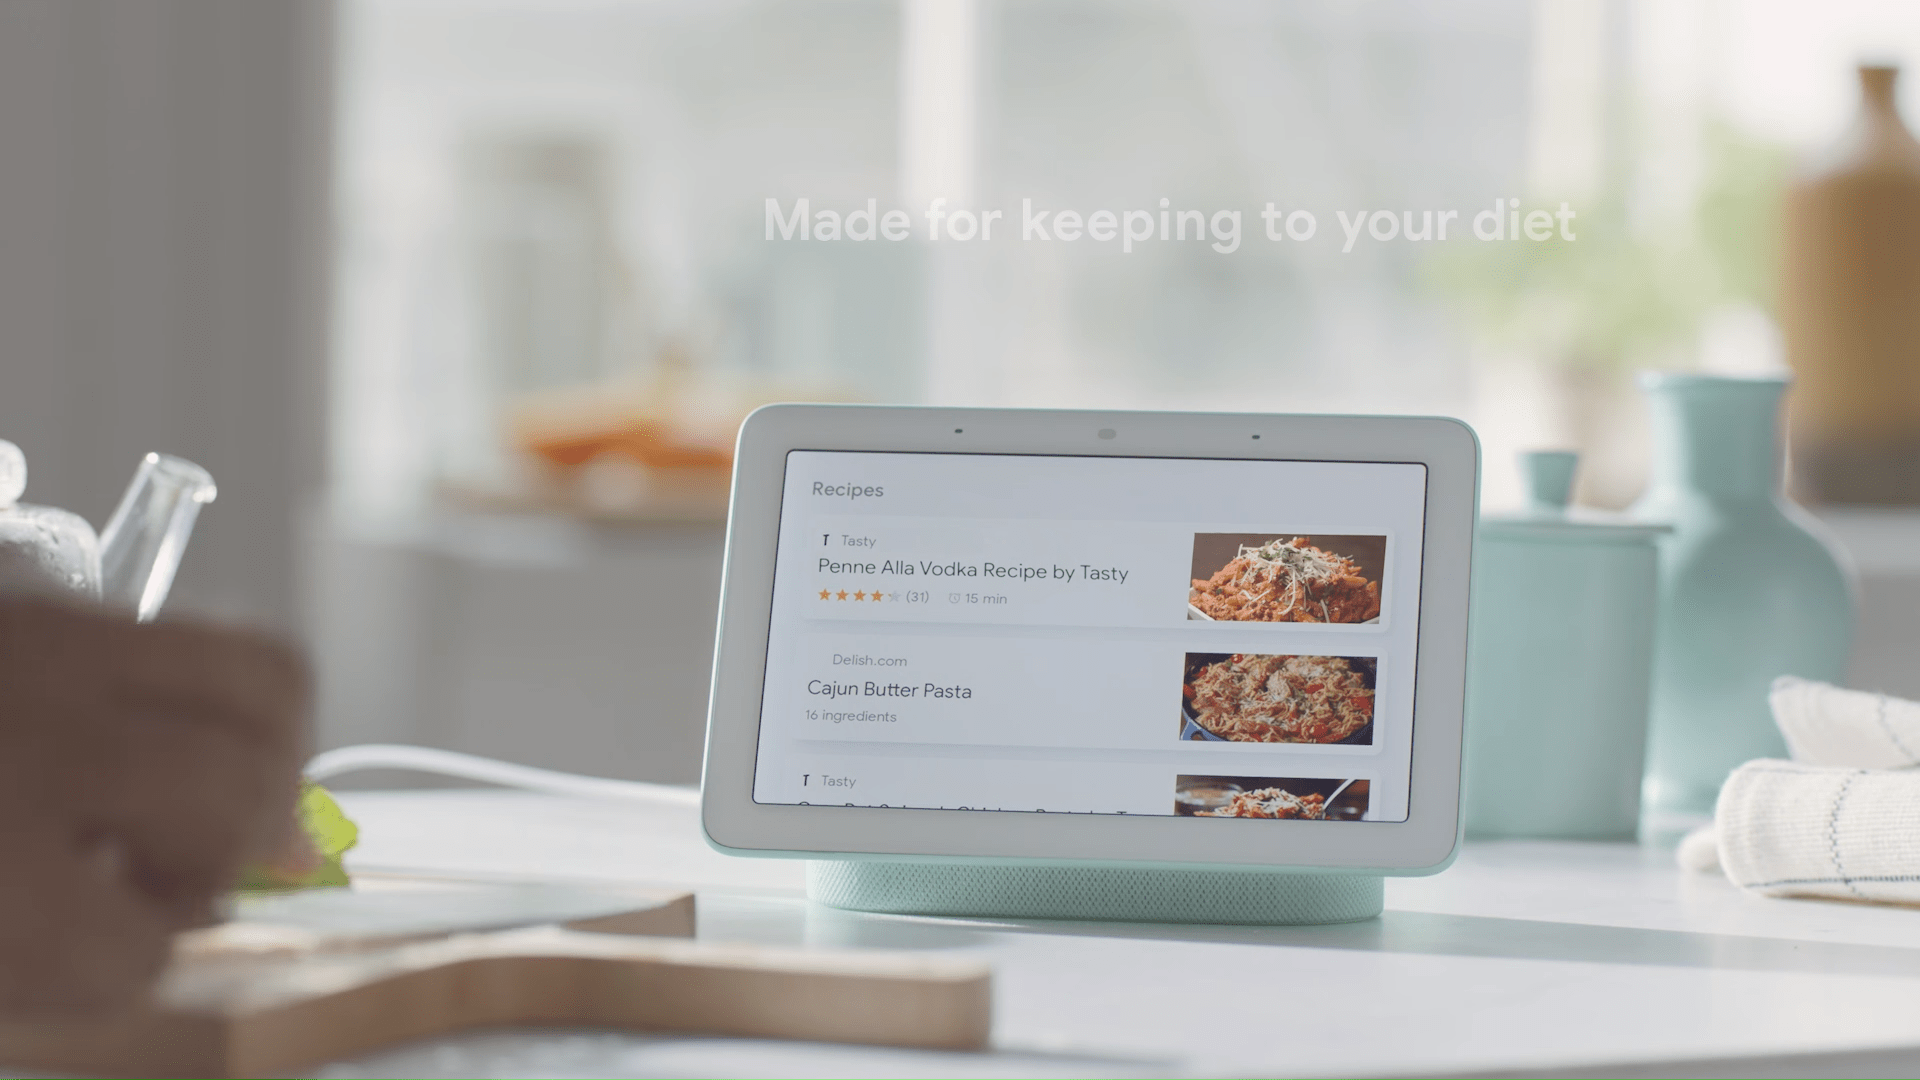 Nest Home Hub Max : Google fait fuiter son prochain Smart Display